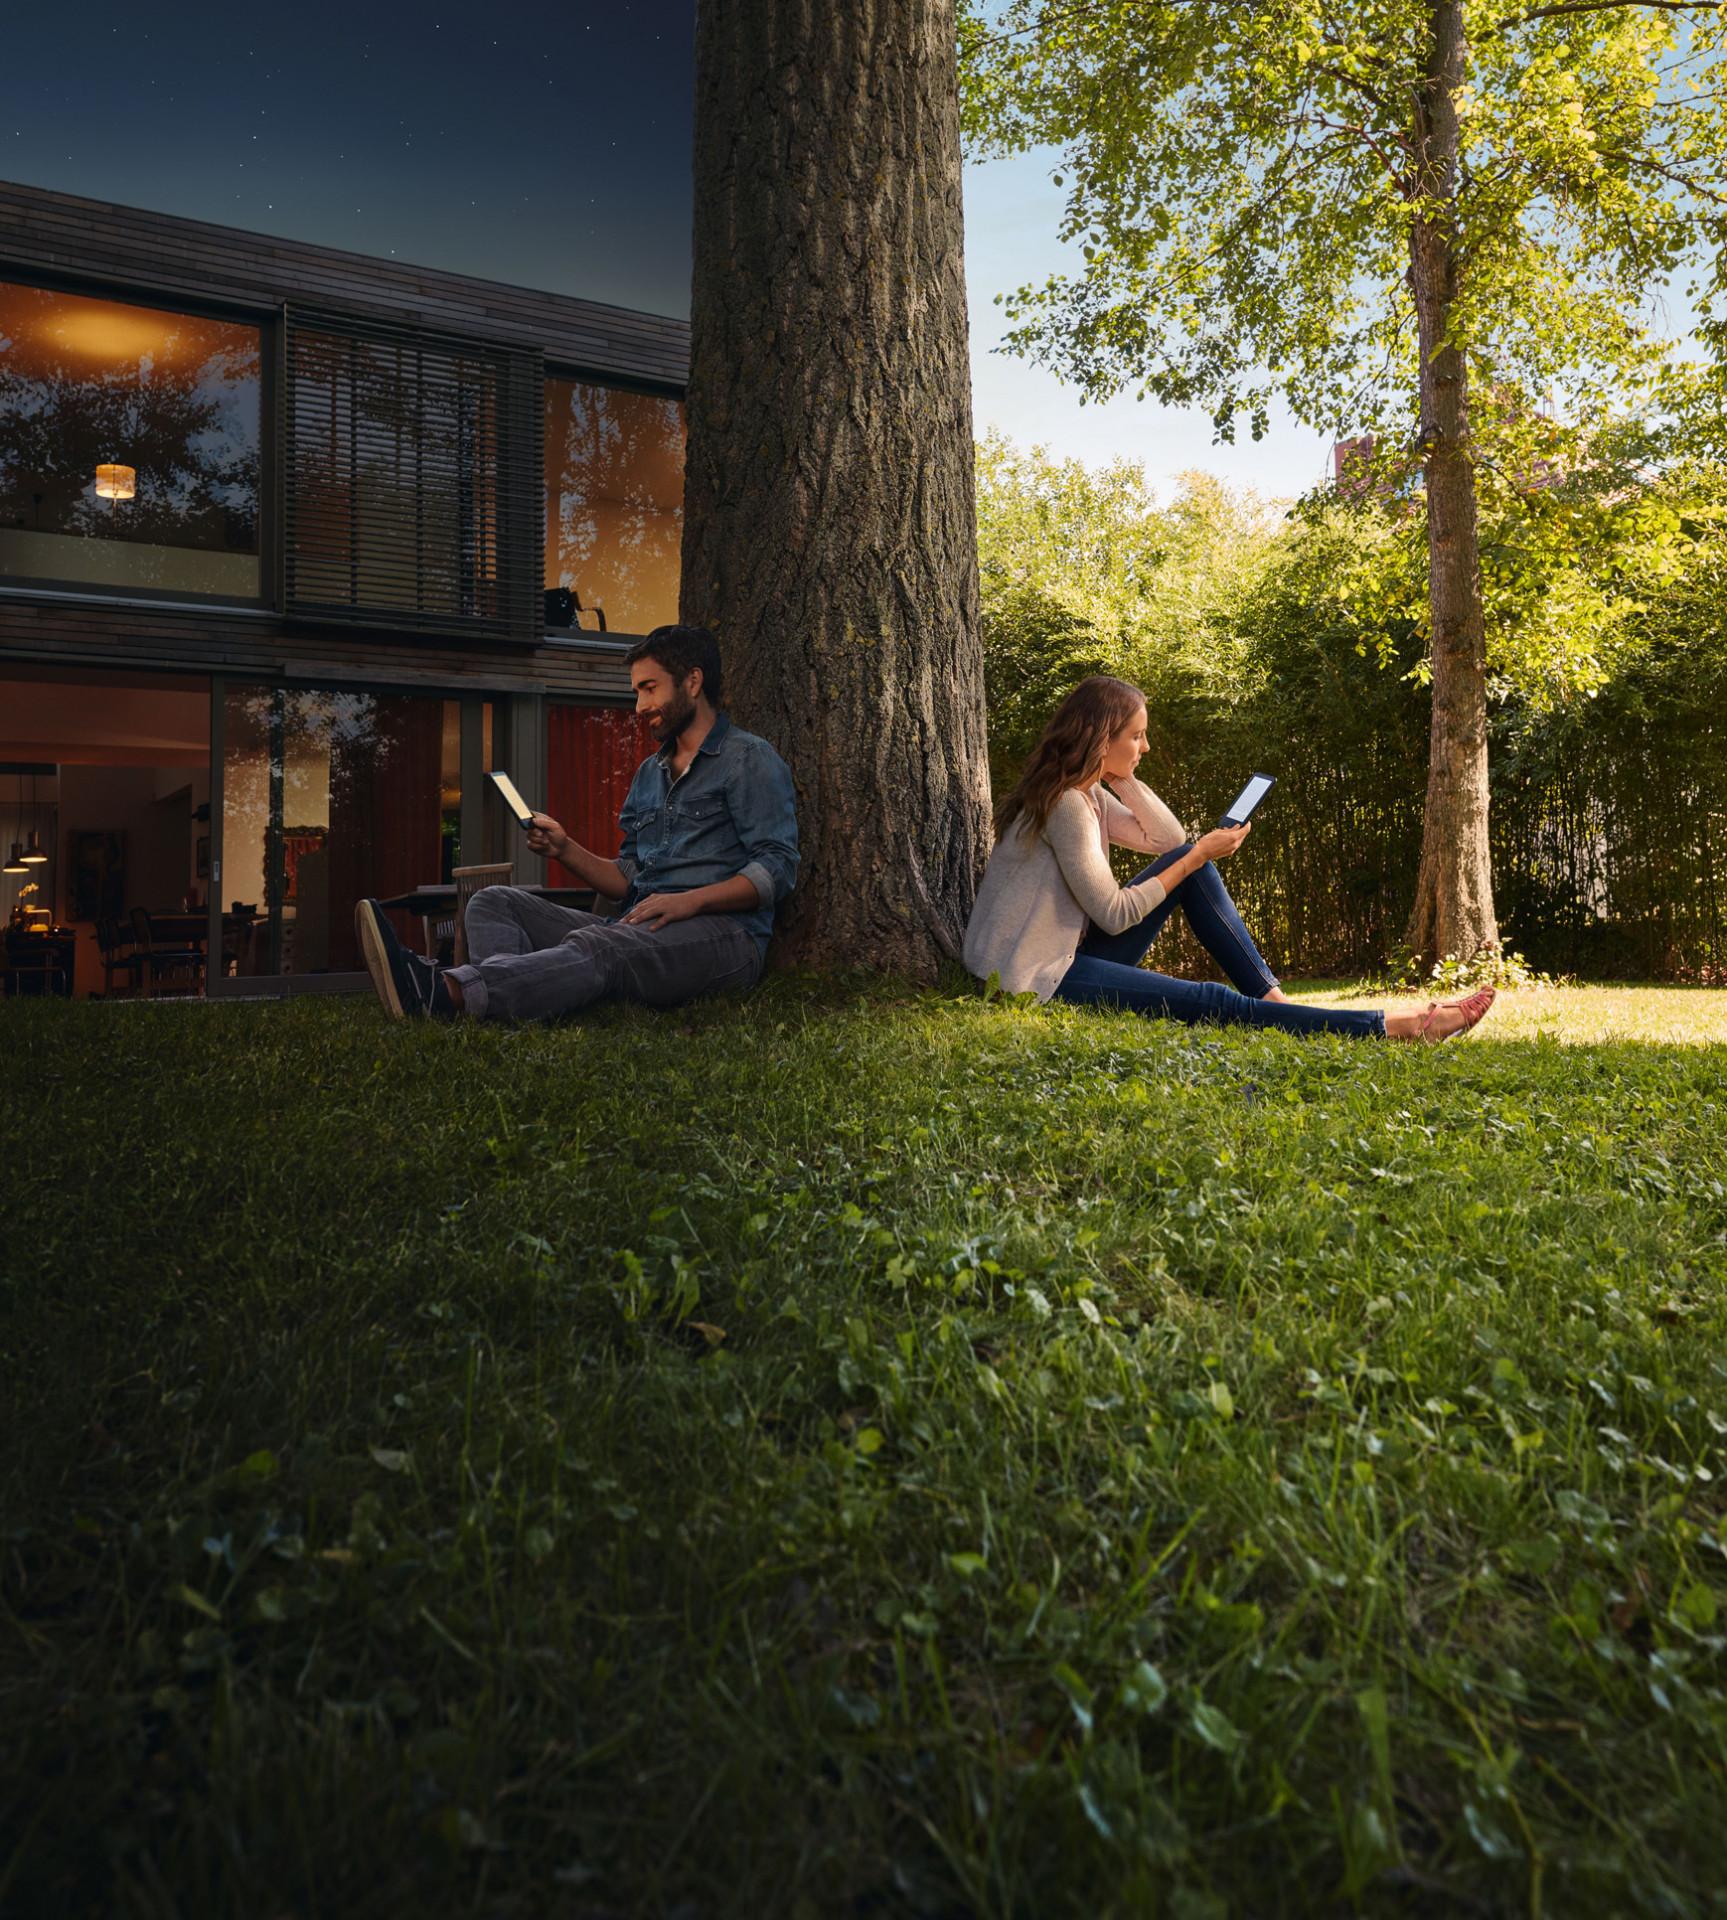 stiftung warentest b chereien sind bei e books preis. Black Bedroom Furniture Sets. Home Design Ideas